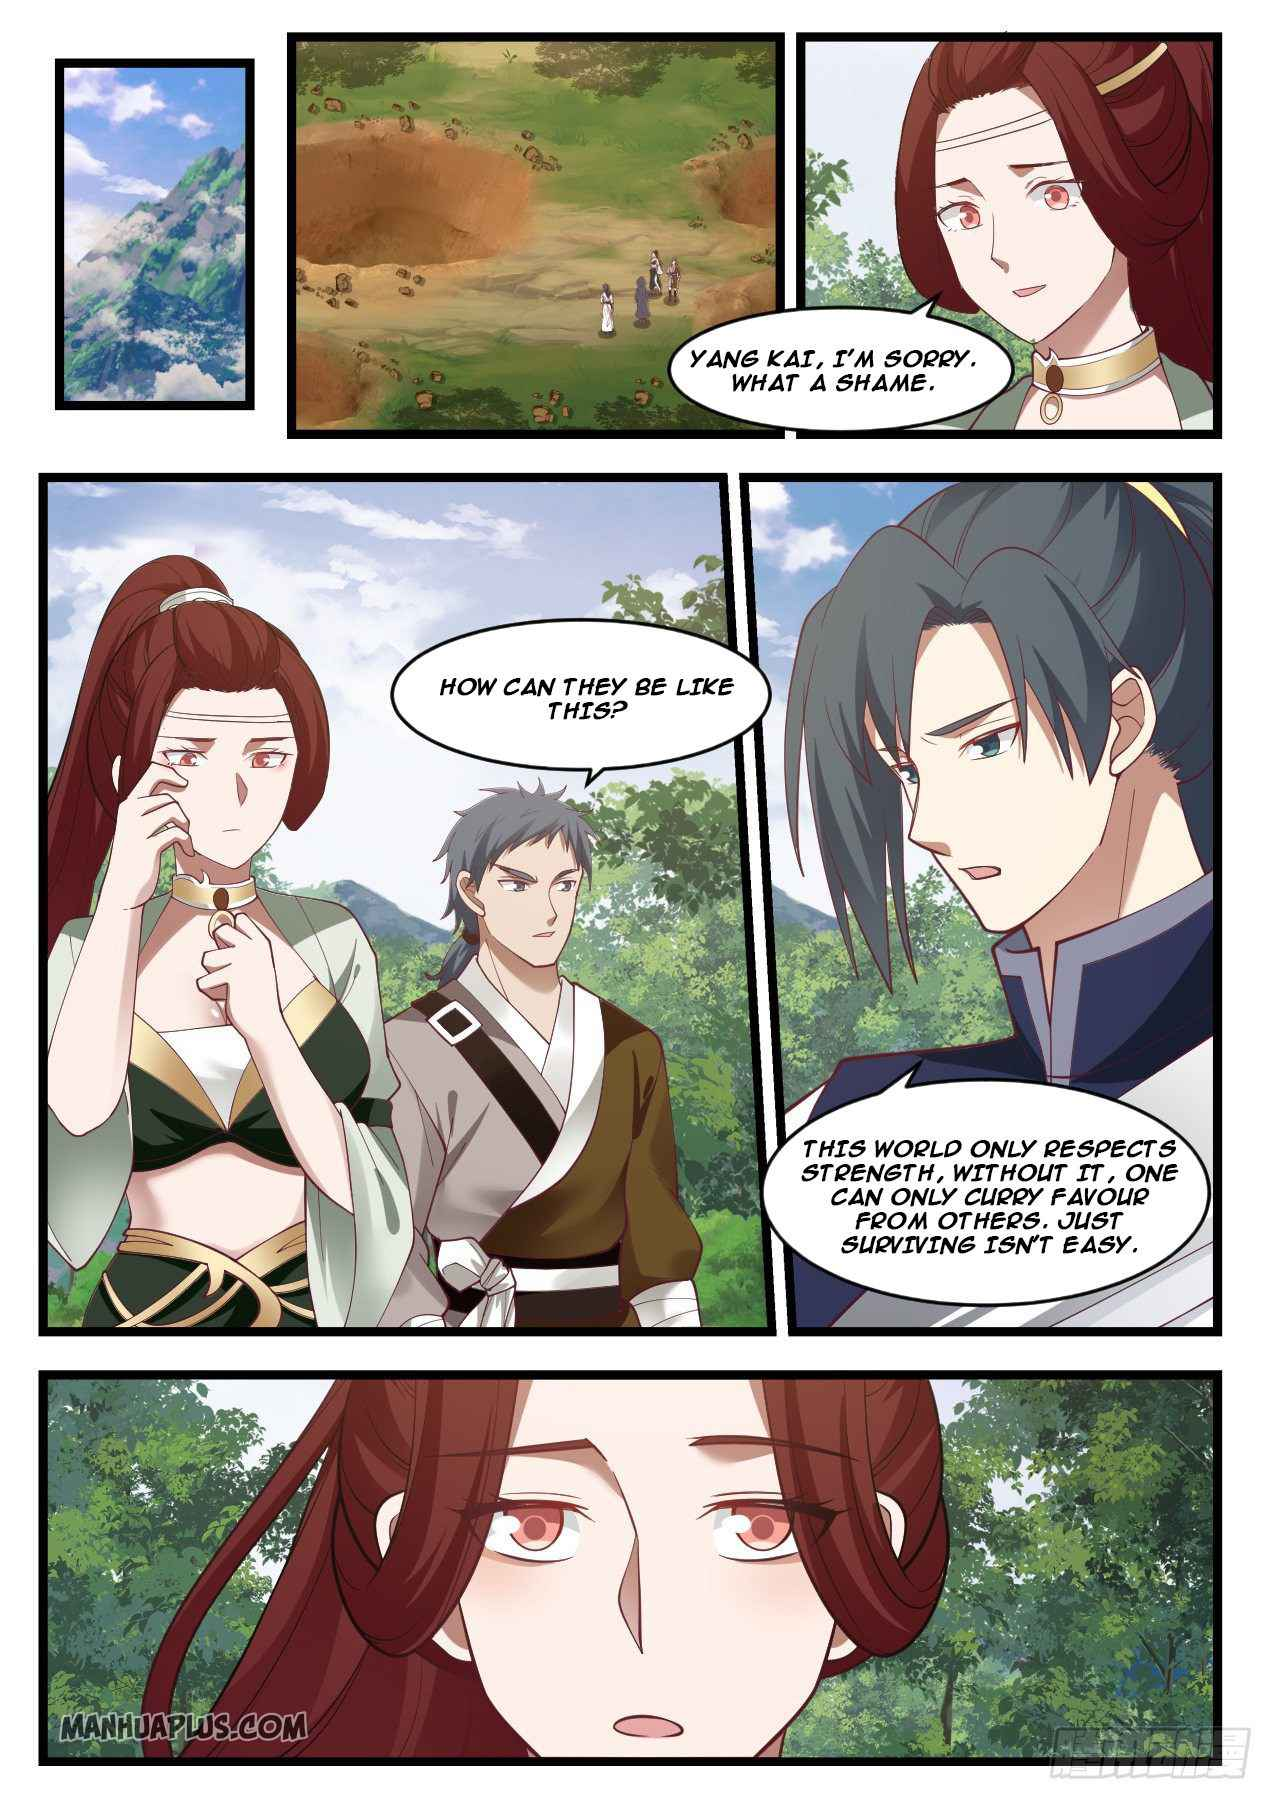 Martial Peak - chapter 1020-eng-li